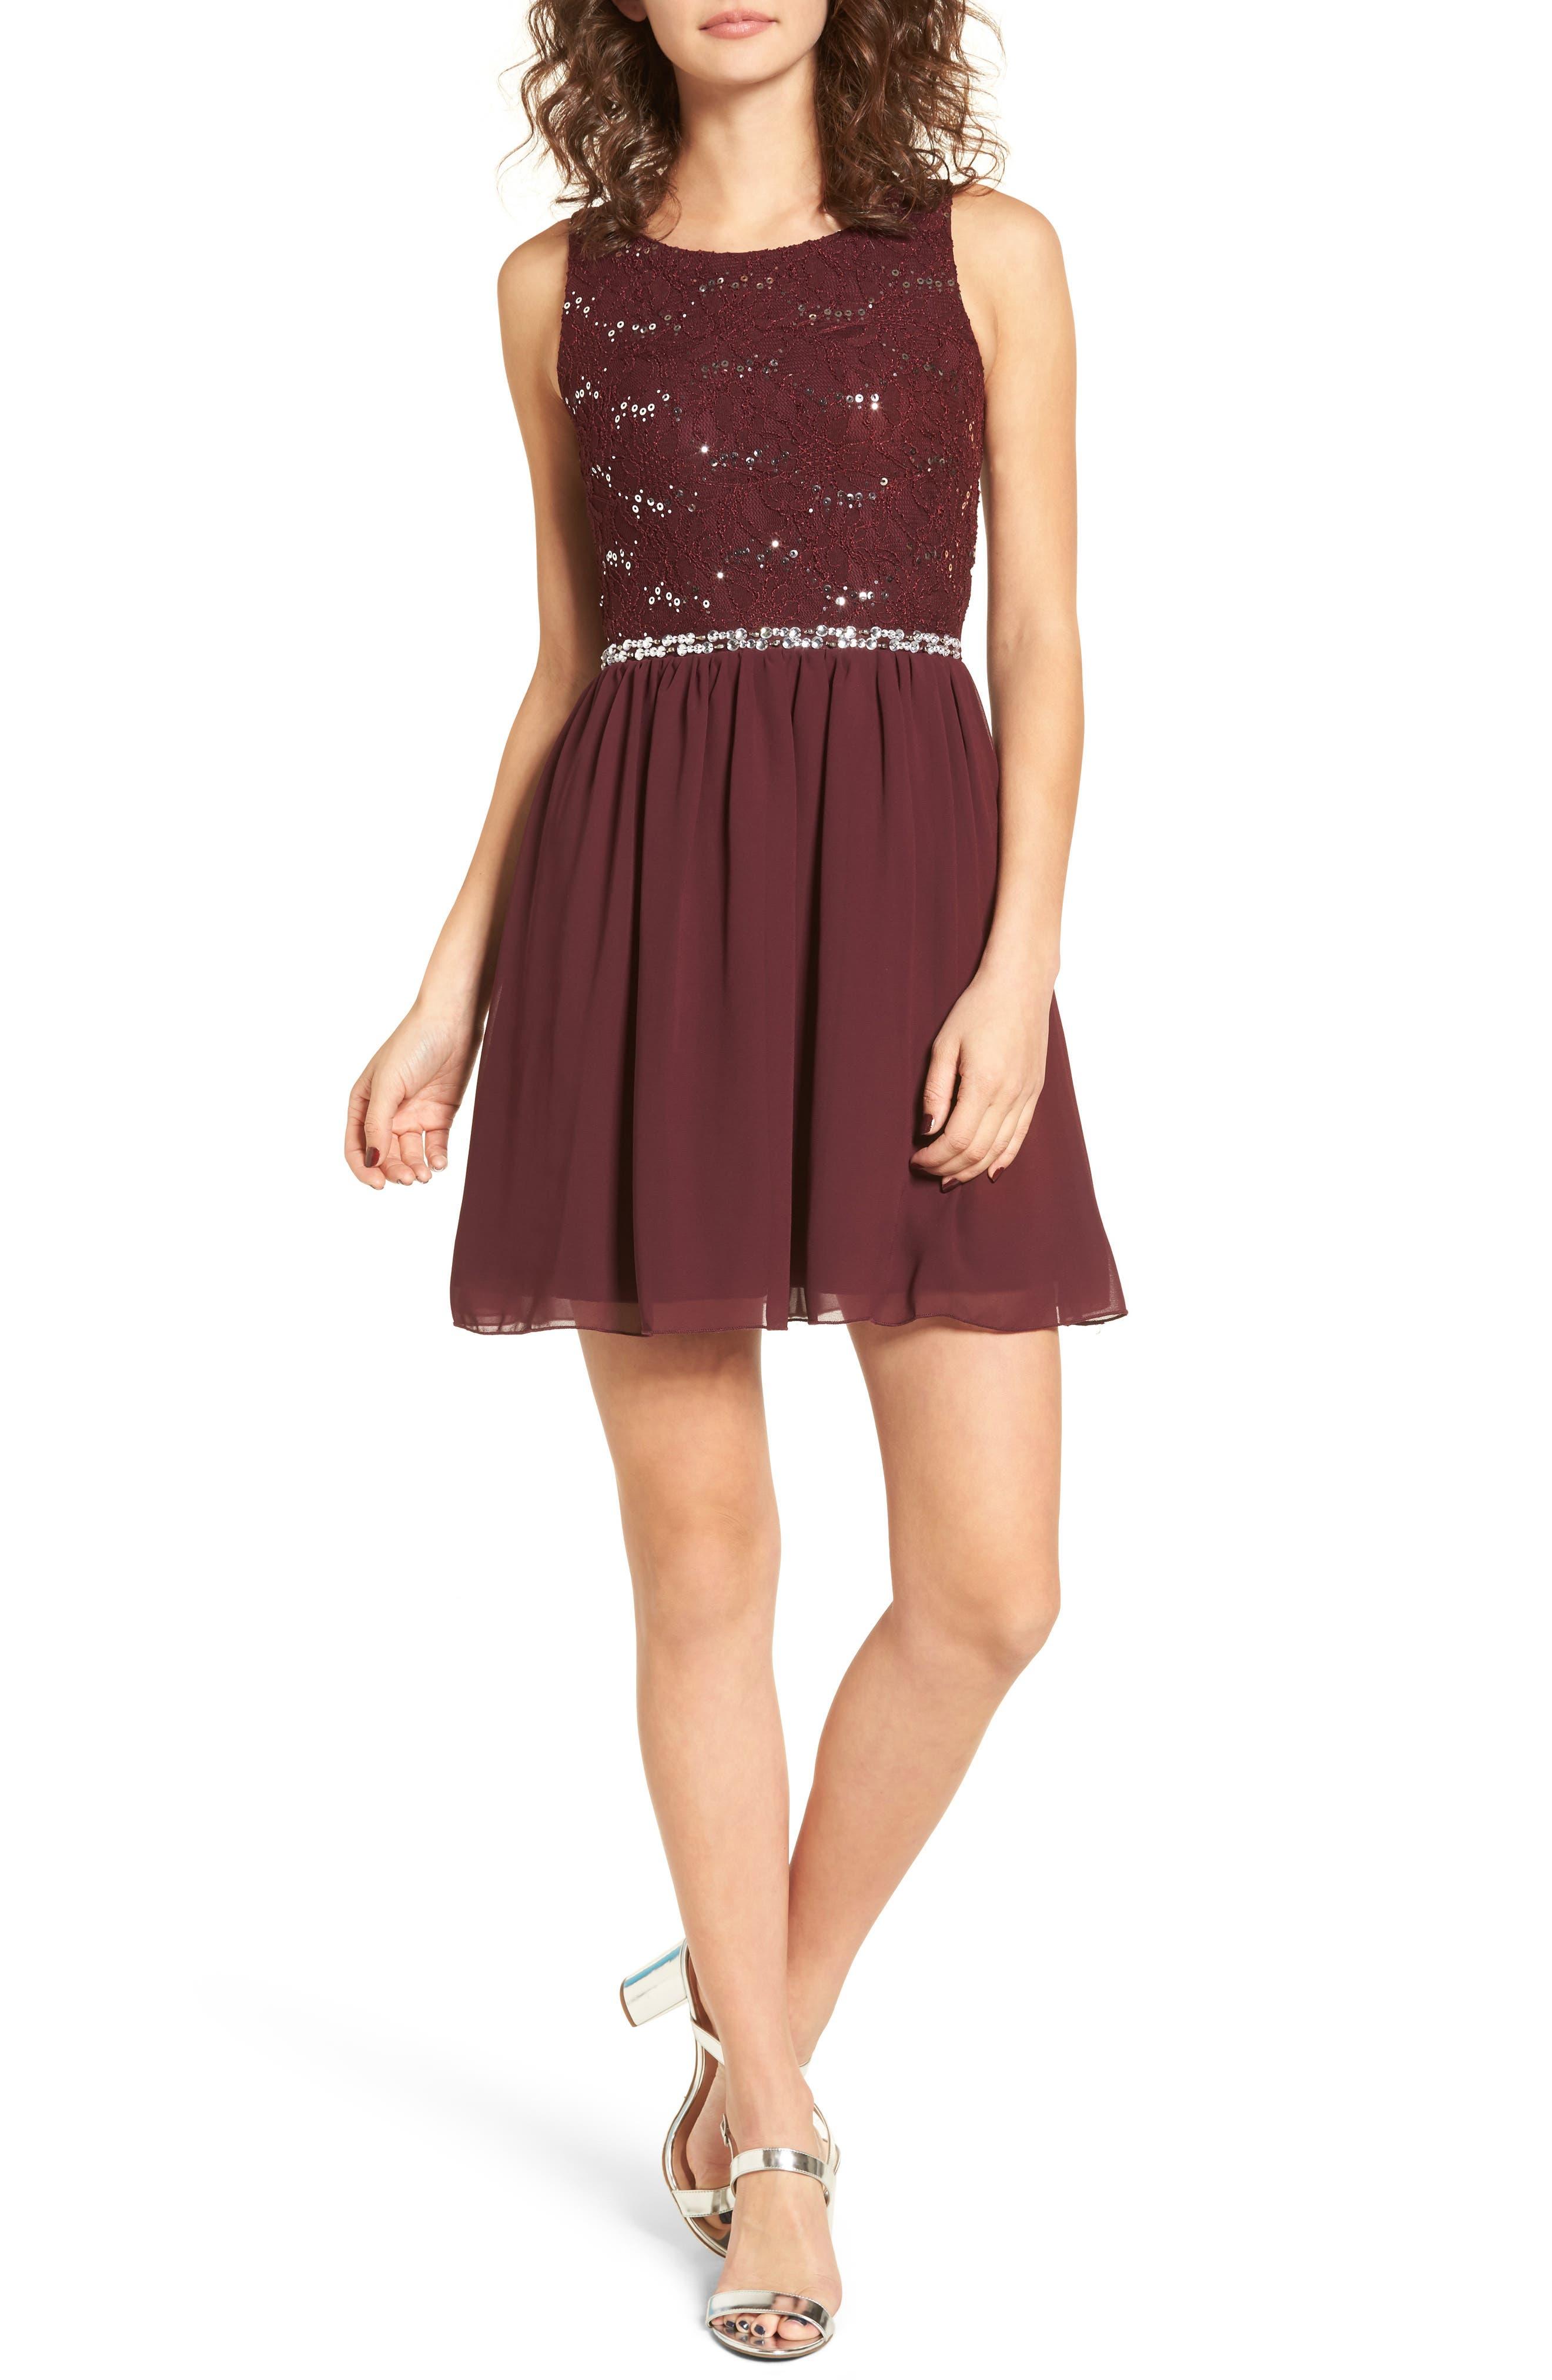 Alternate Image 1 Selected - Speechless Jeweled Belt Dress